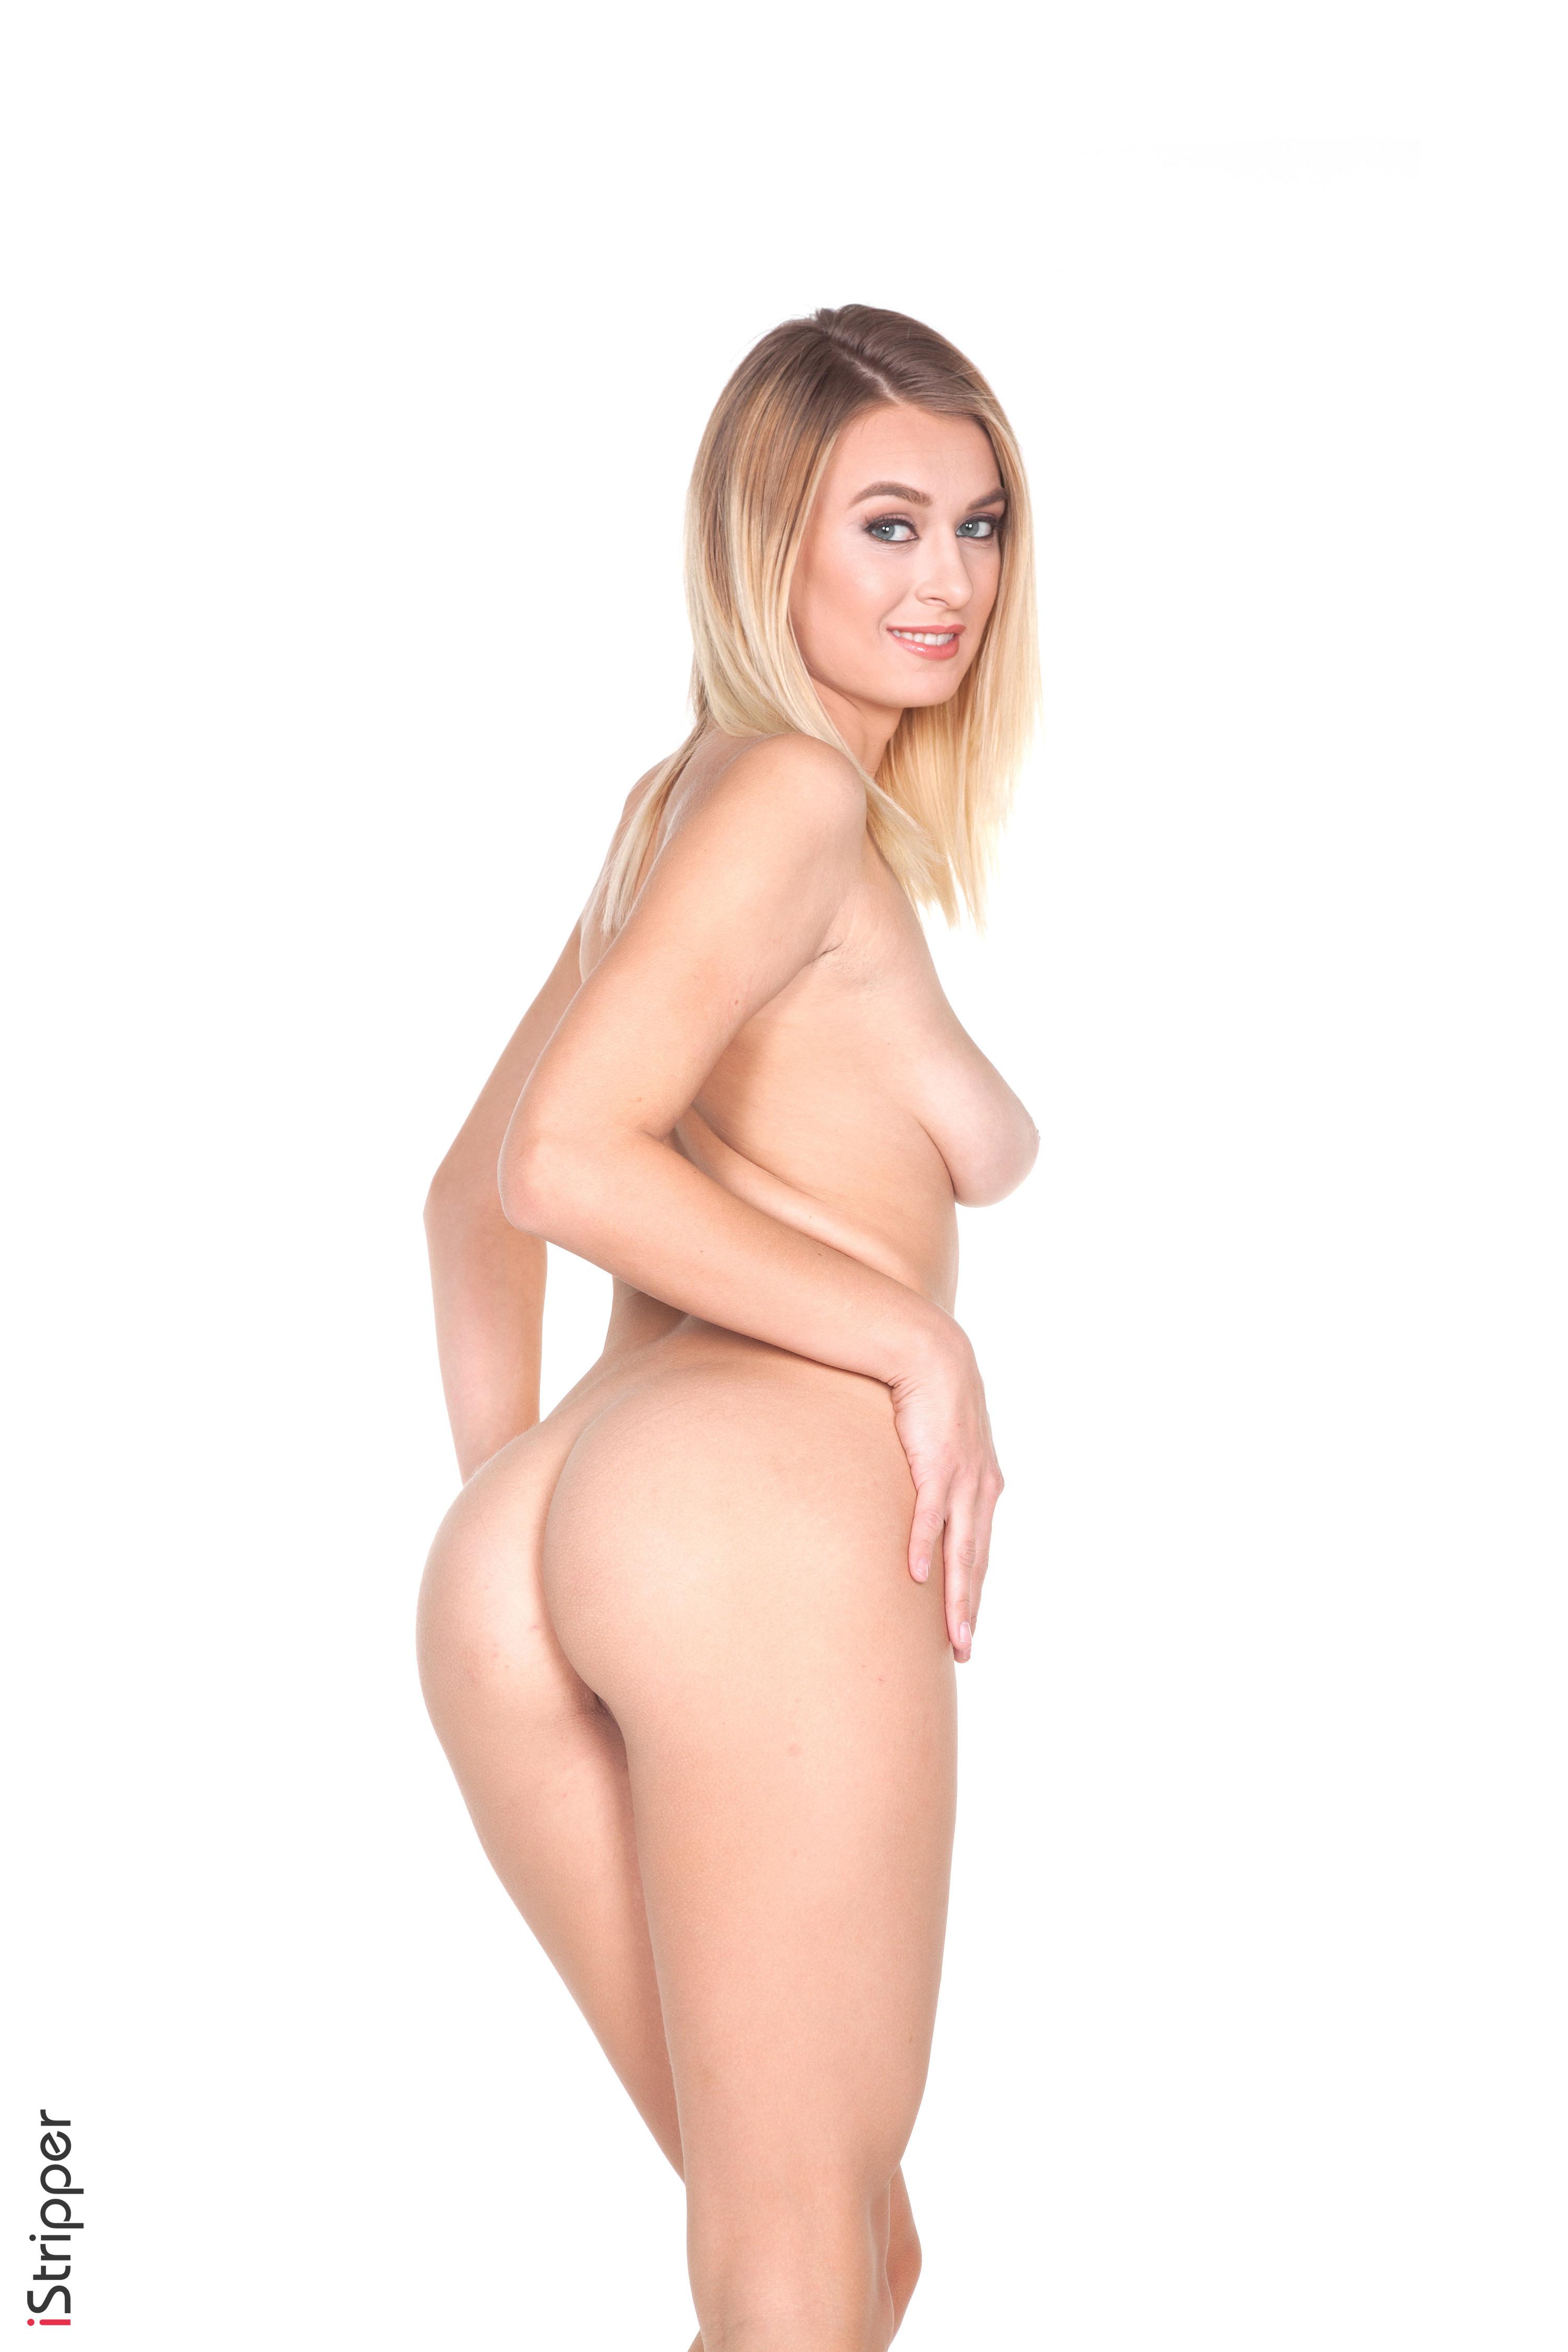 free sexy wallpaper